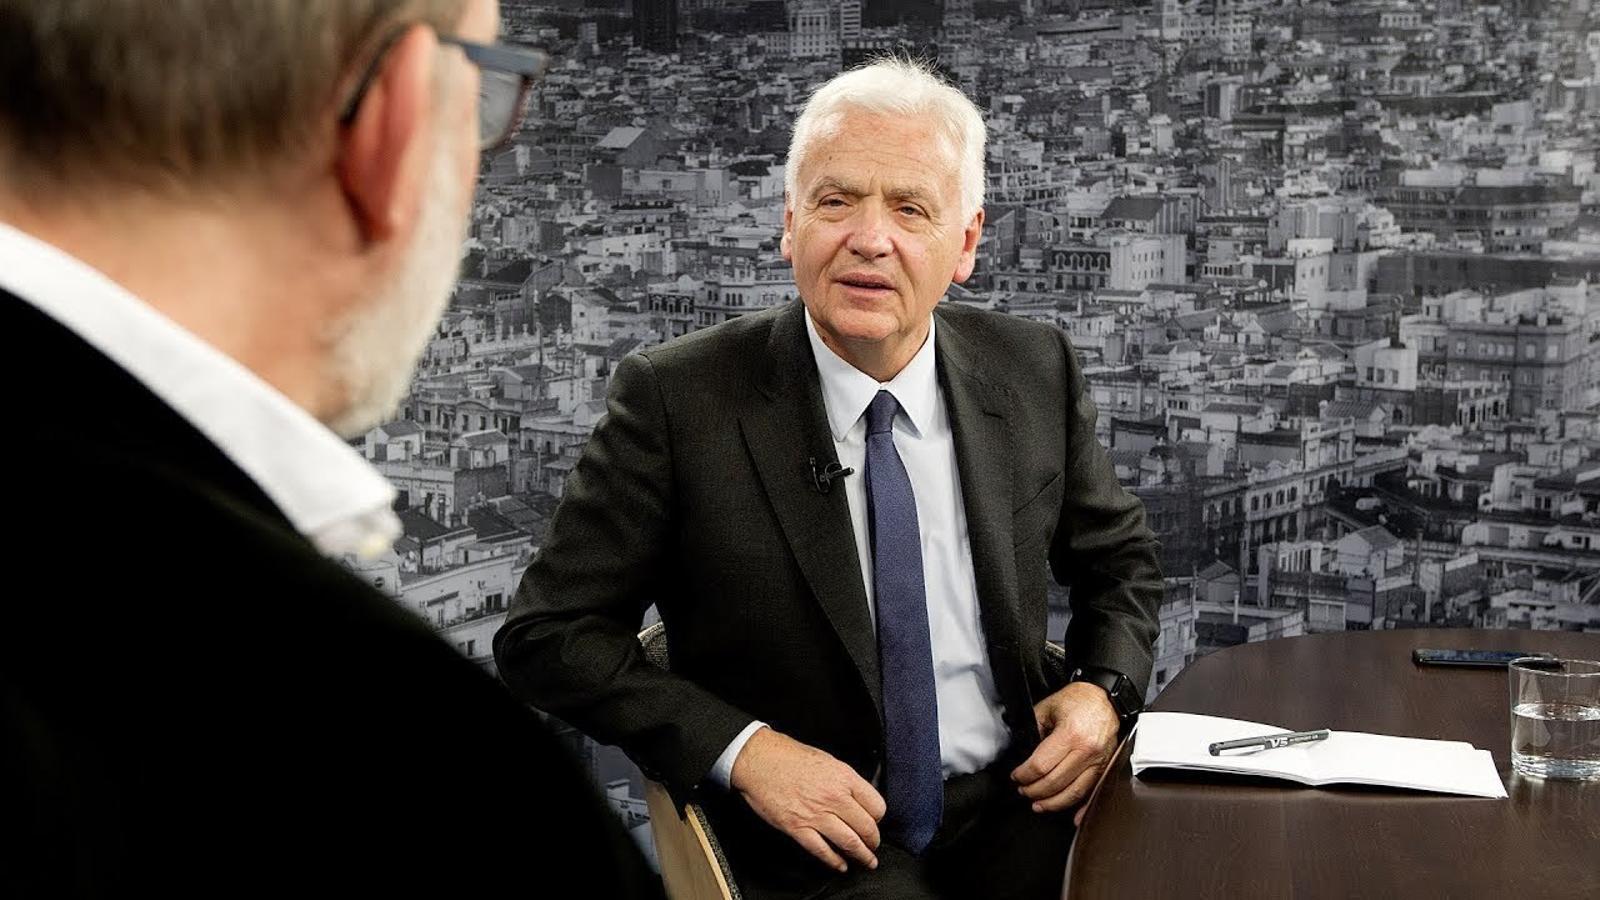 Entrevista d'Antoni Bassas a Ferran Mascarell